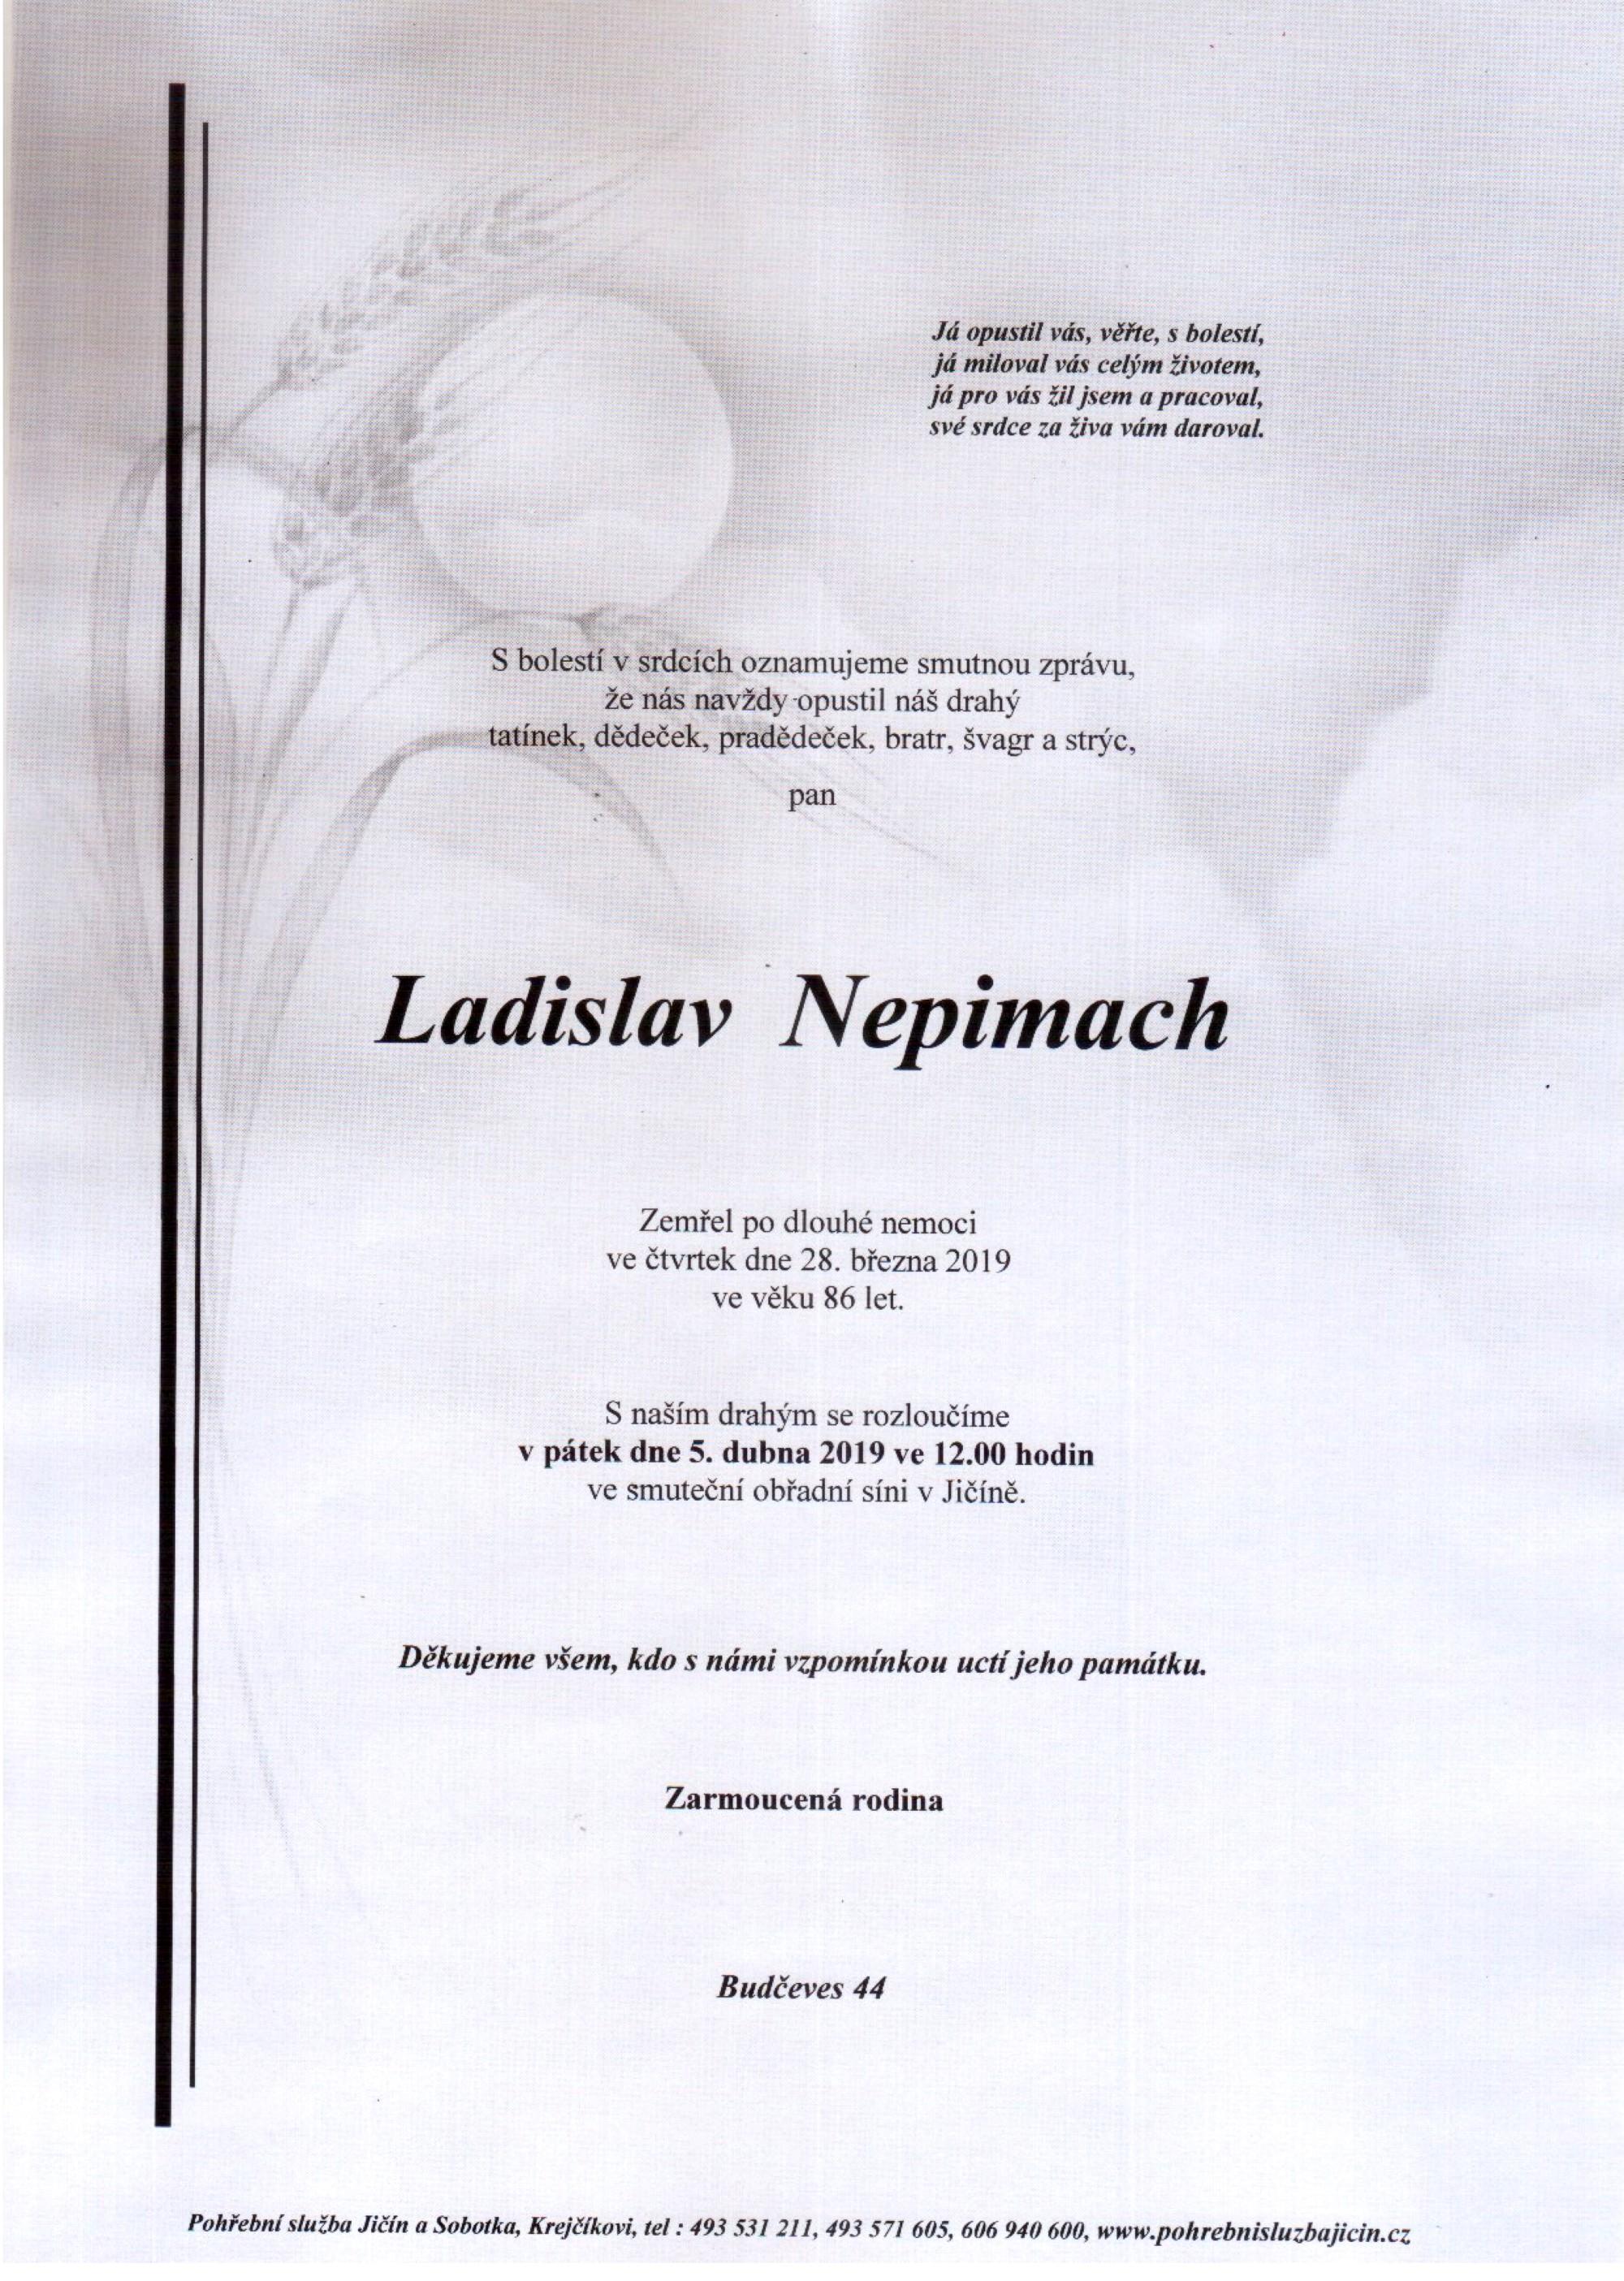 Ladislav Nepimach